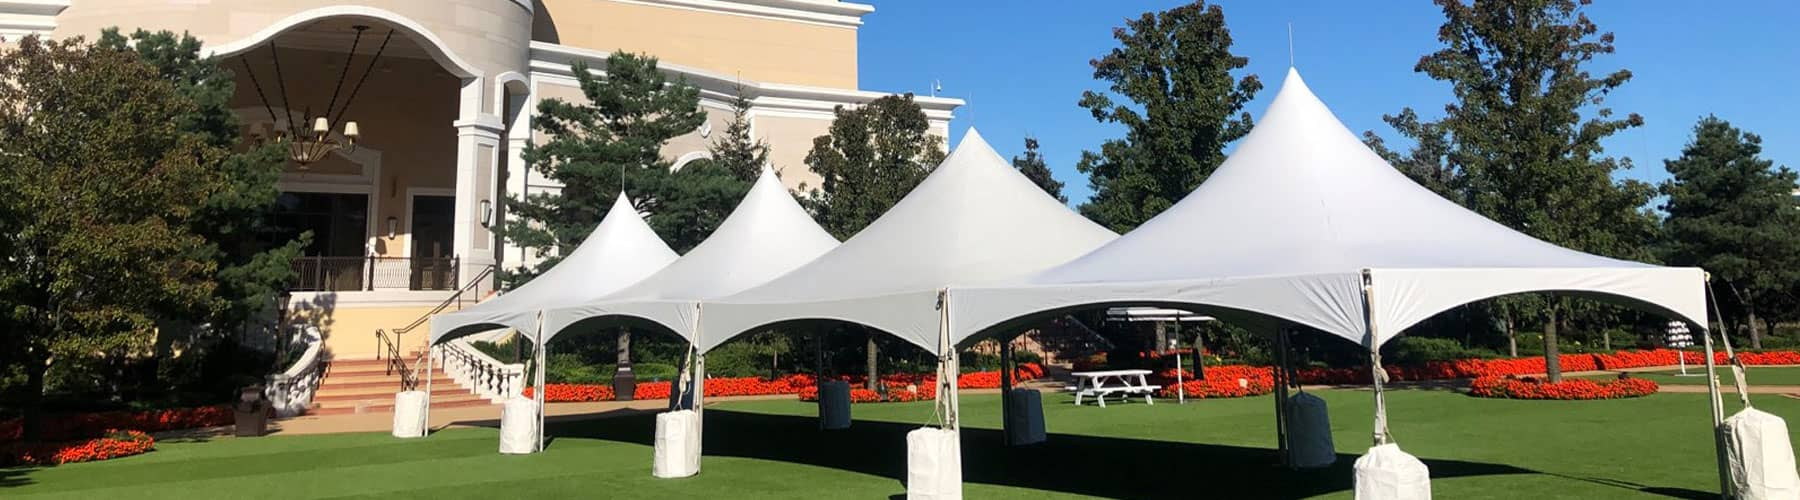 tent-slide